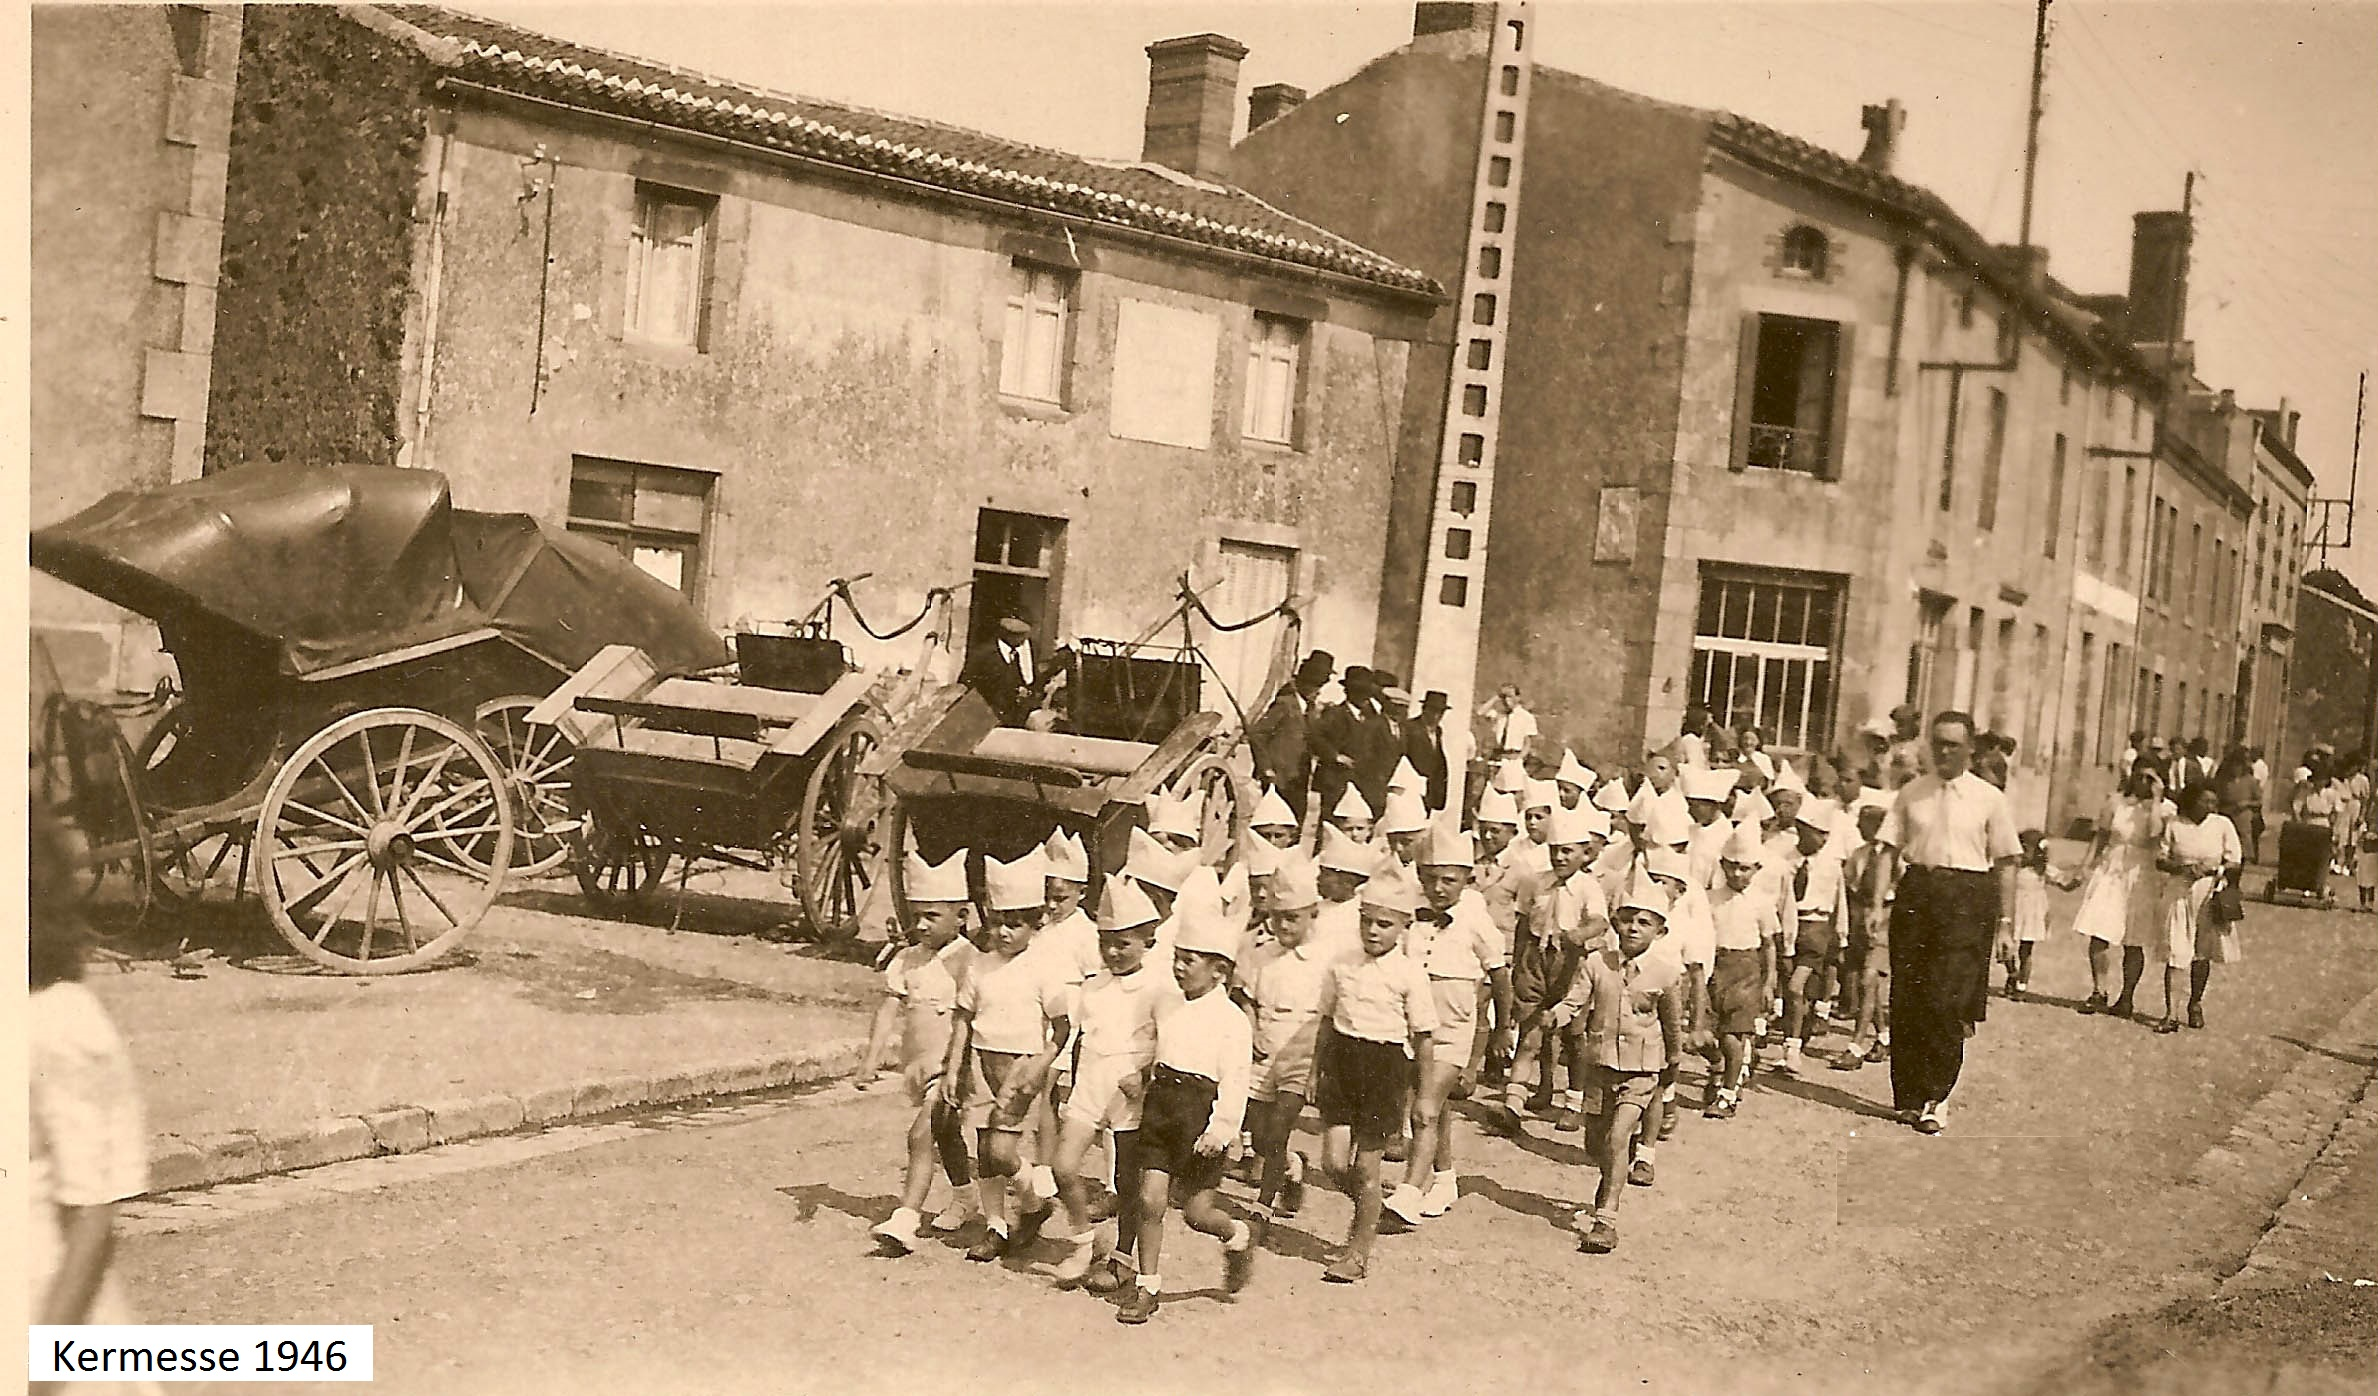 Kermesse 1946